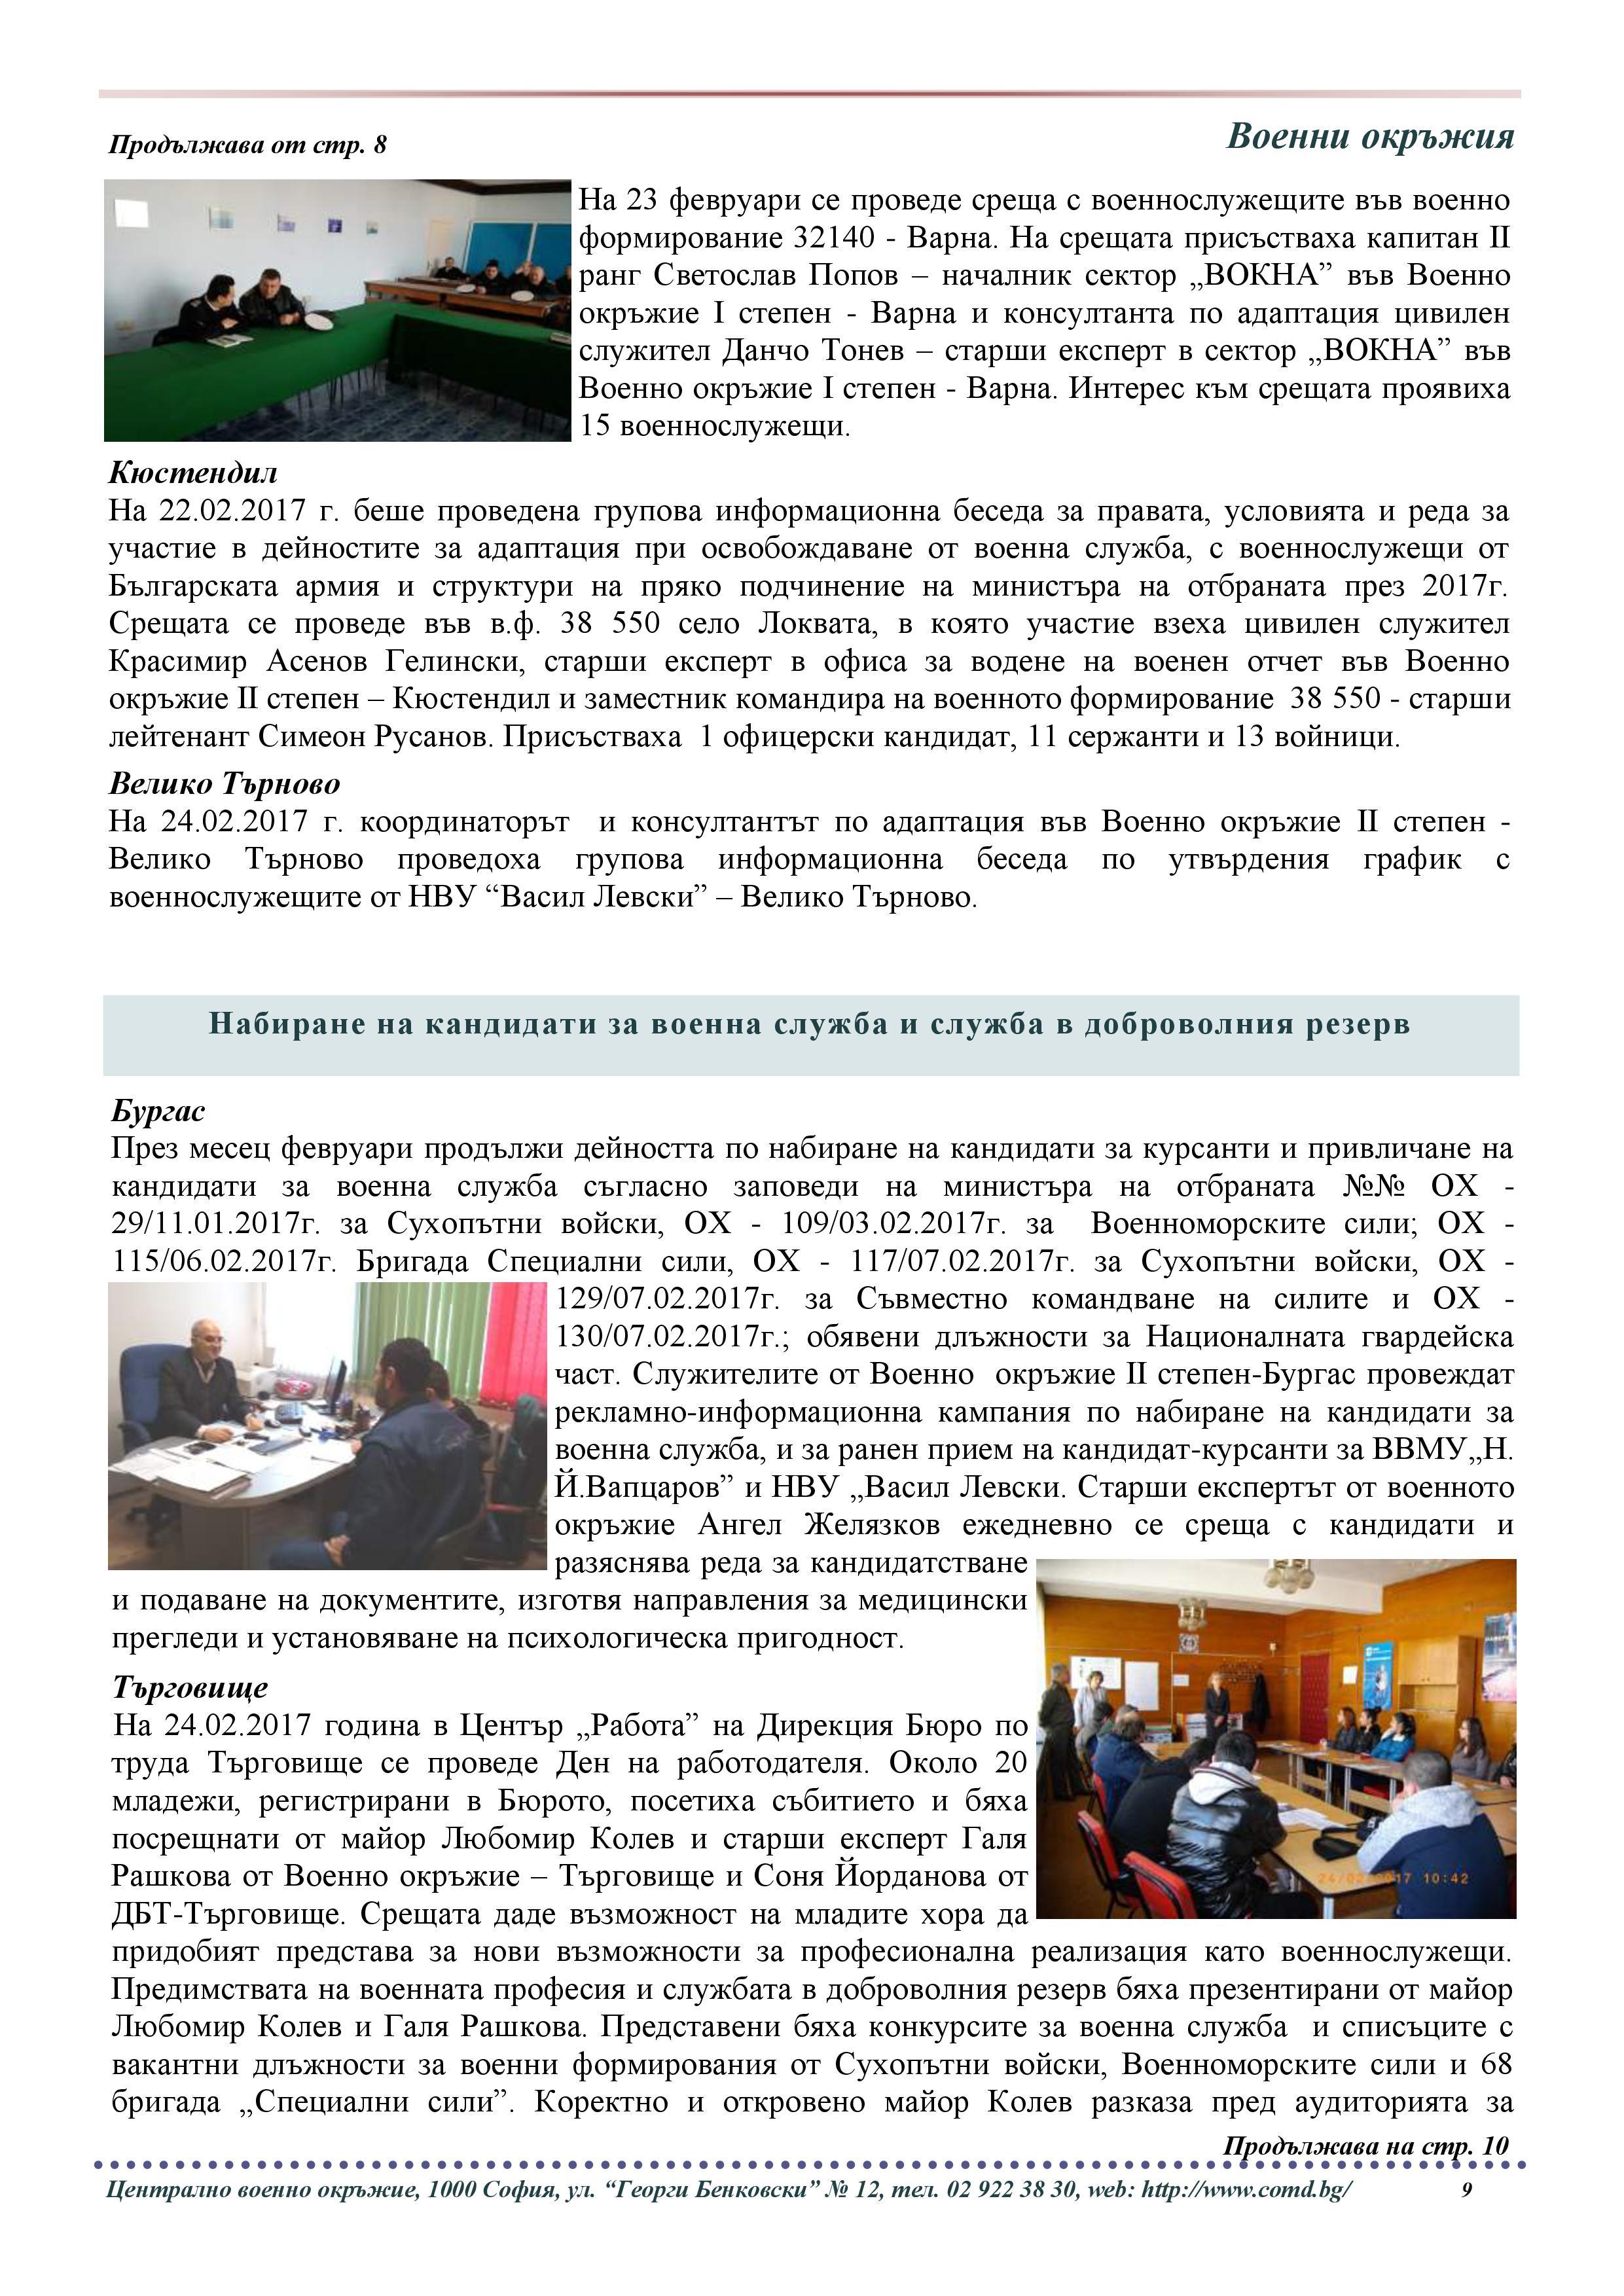 http://armymedia.bg/wp-content/uploads/2015/06/IB_2_2017g.compressed-za-izpra6tane-22.03.2017.page09.jpg